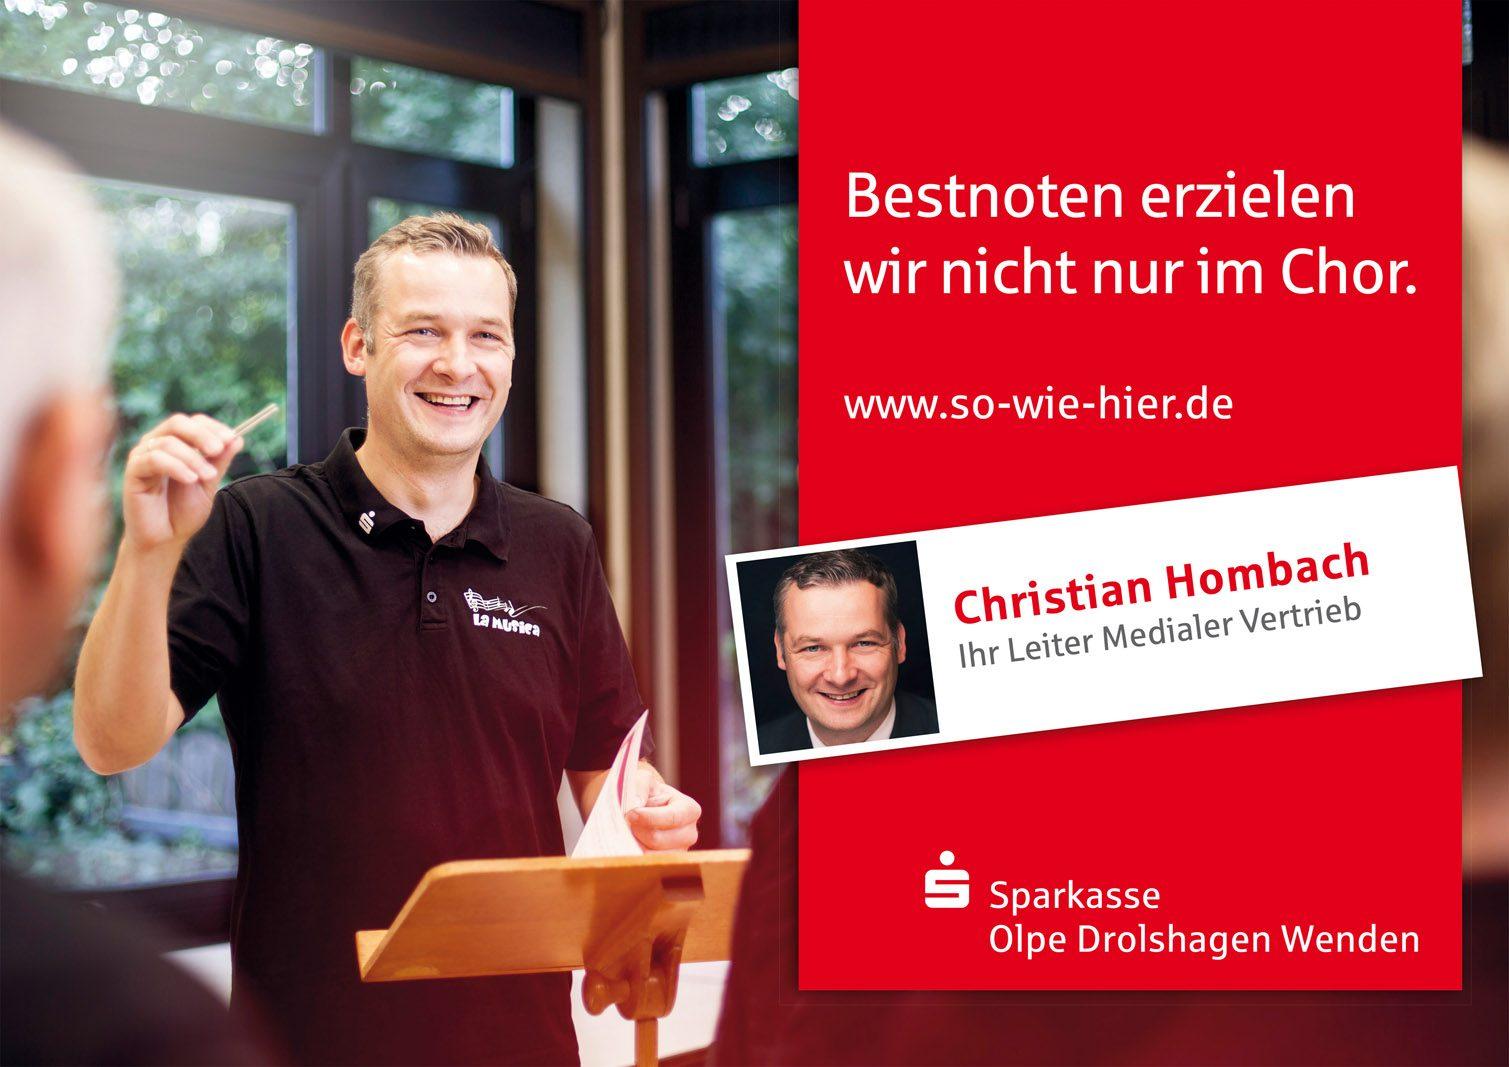 kampagne-sparkasse-olpe-drolshagen-wenden005